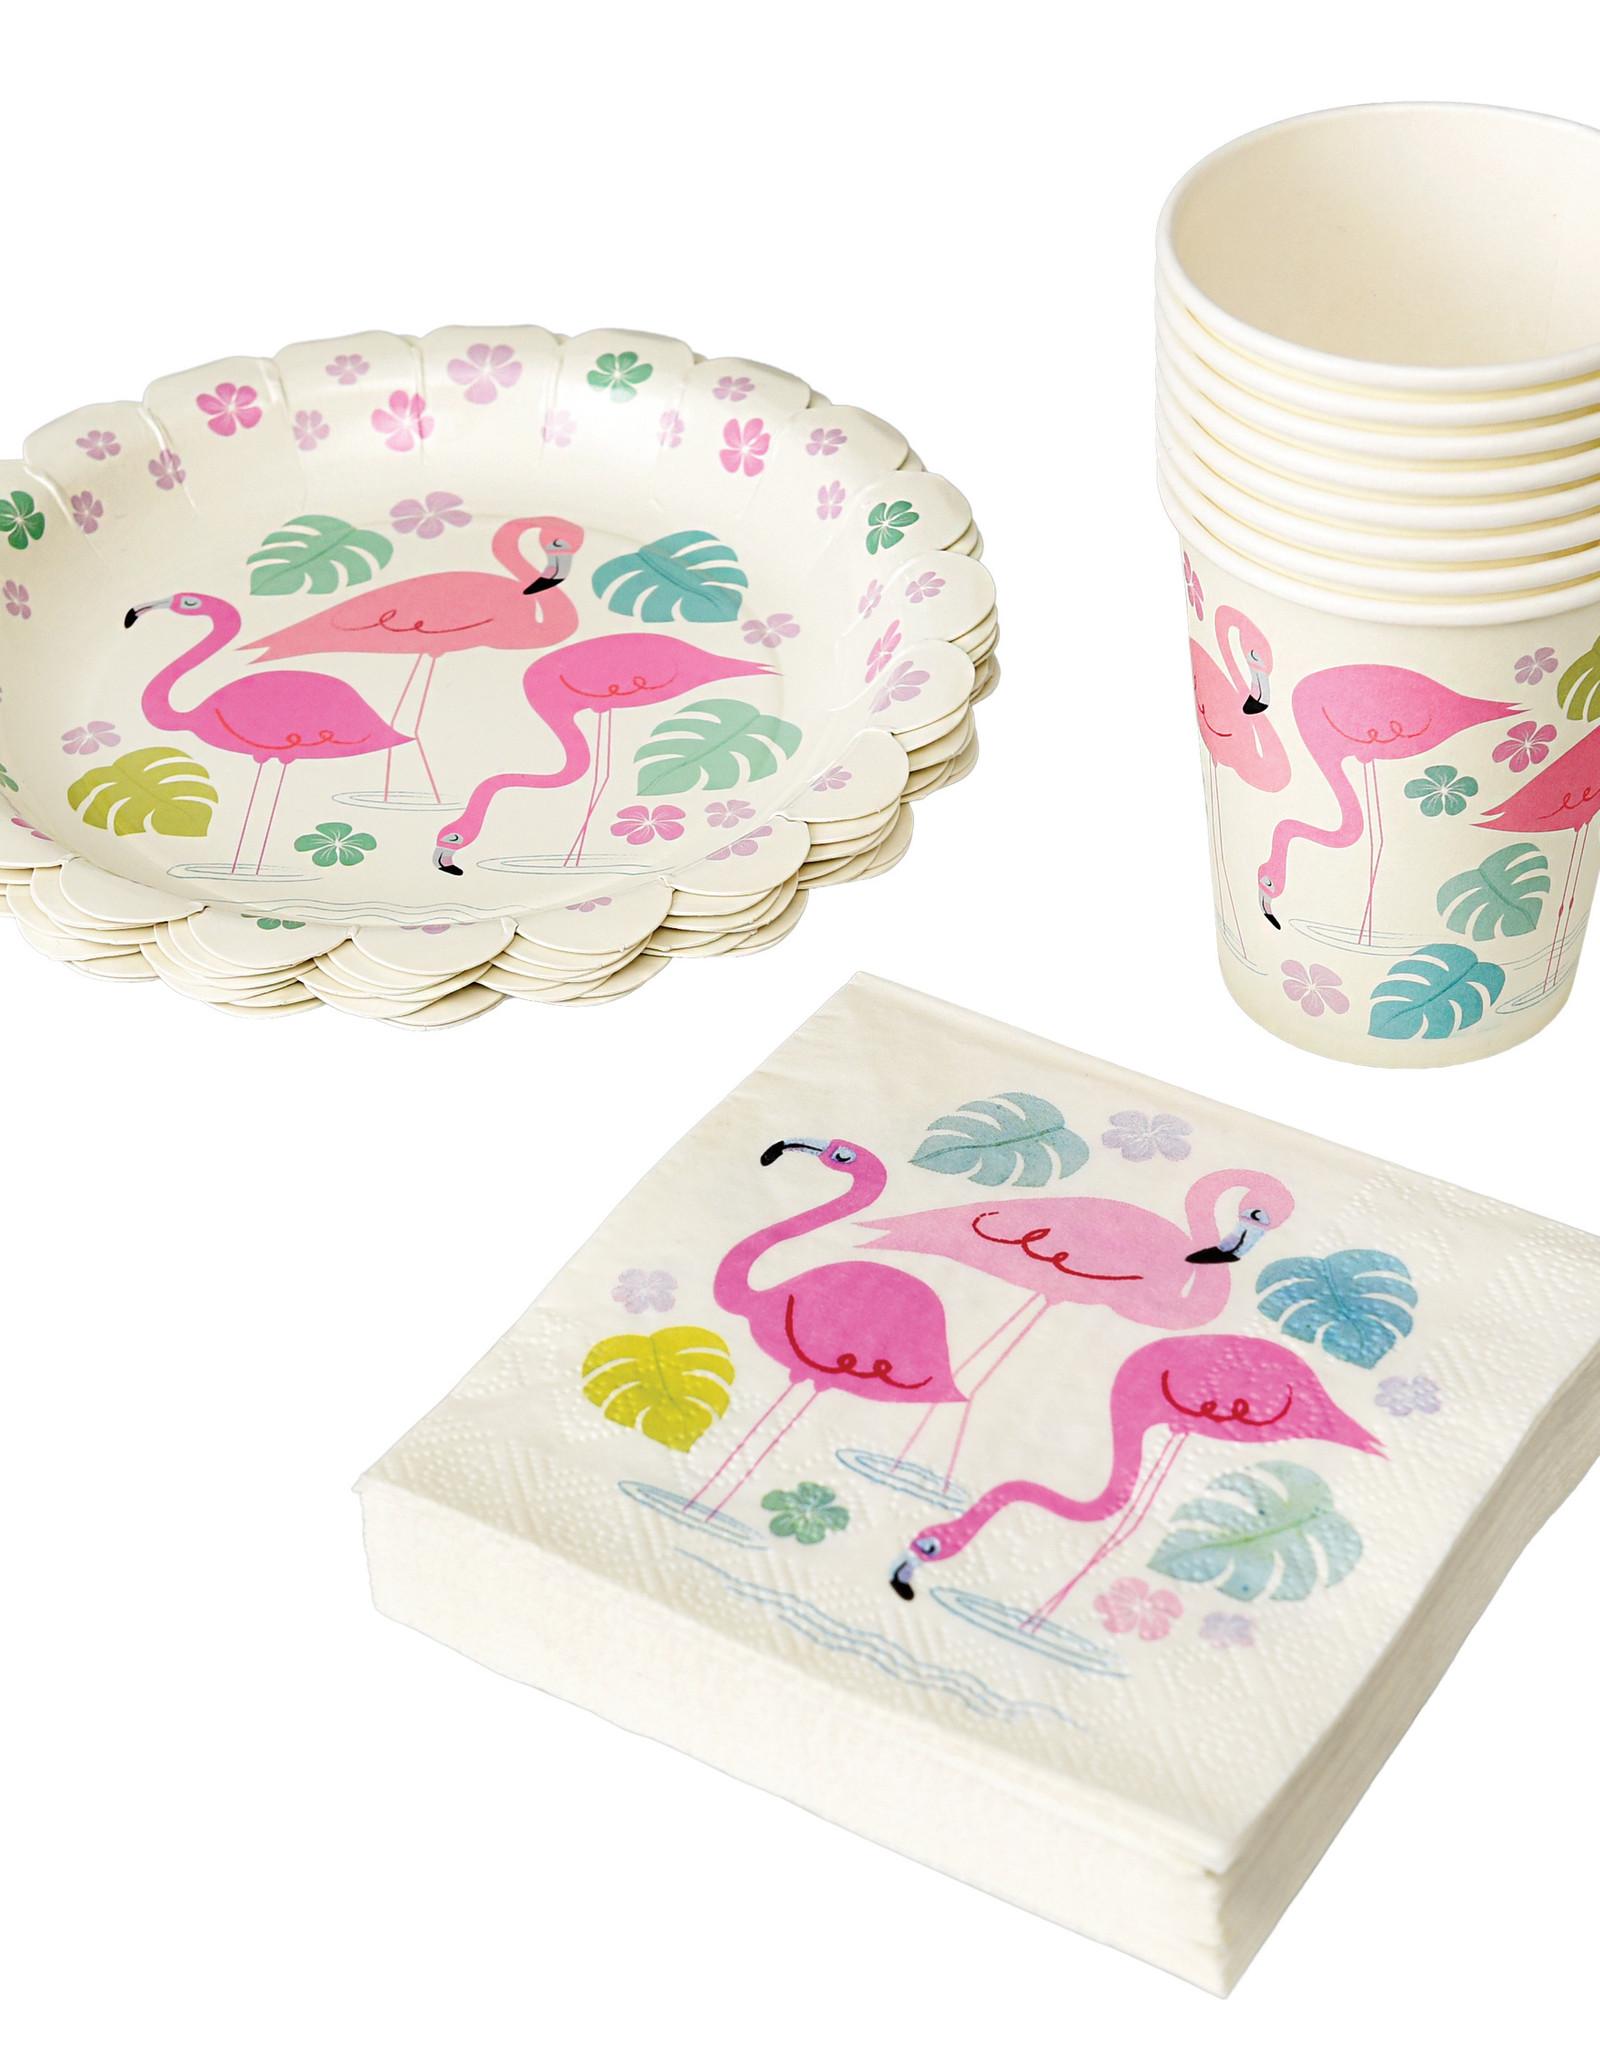 Rex London Servietten (20 stuks) - Flamingo bay